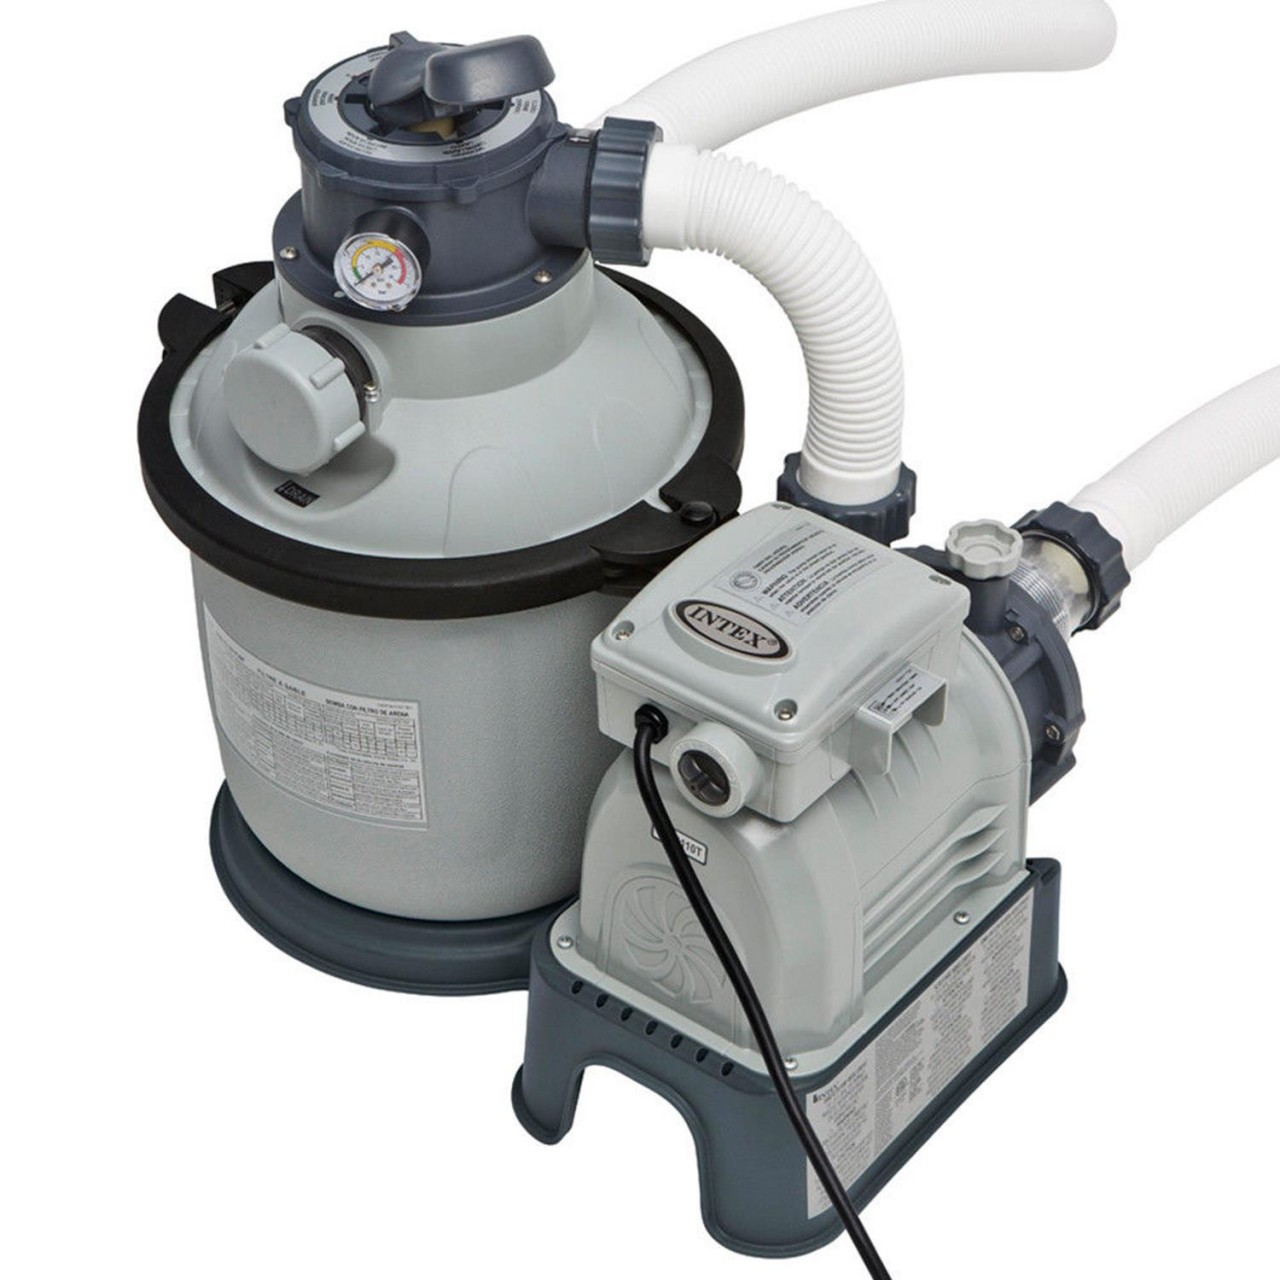 Intex 28644 Sandfilteranlage 4m³/h Filterpumpe 4000 l/h Filterkessel für Pool